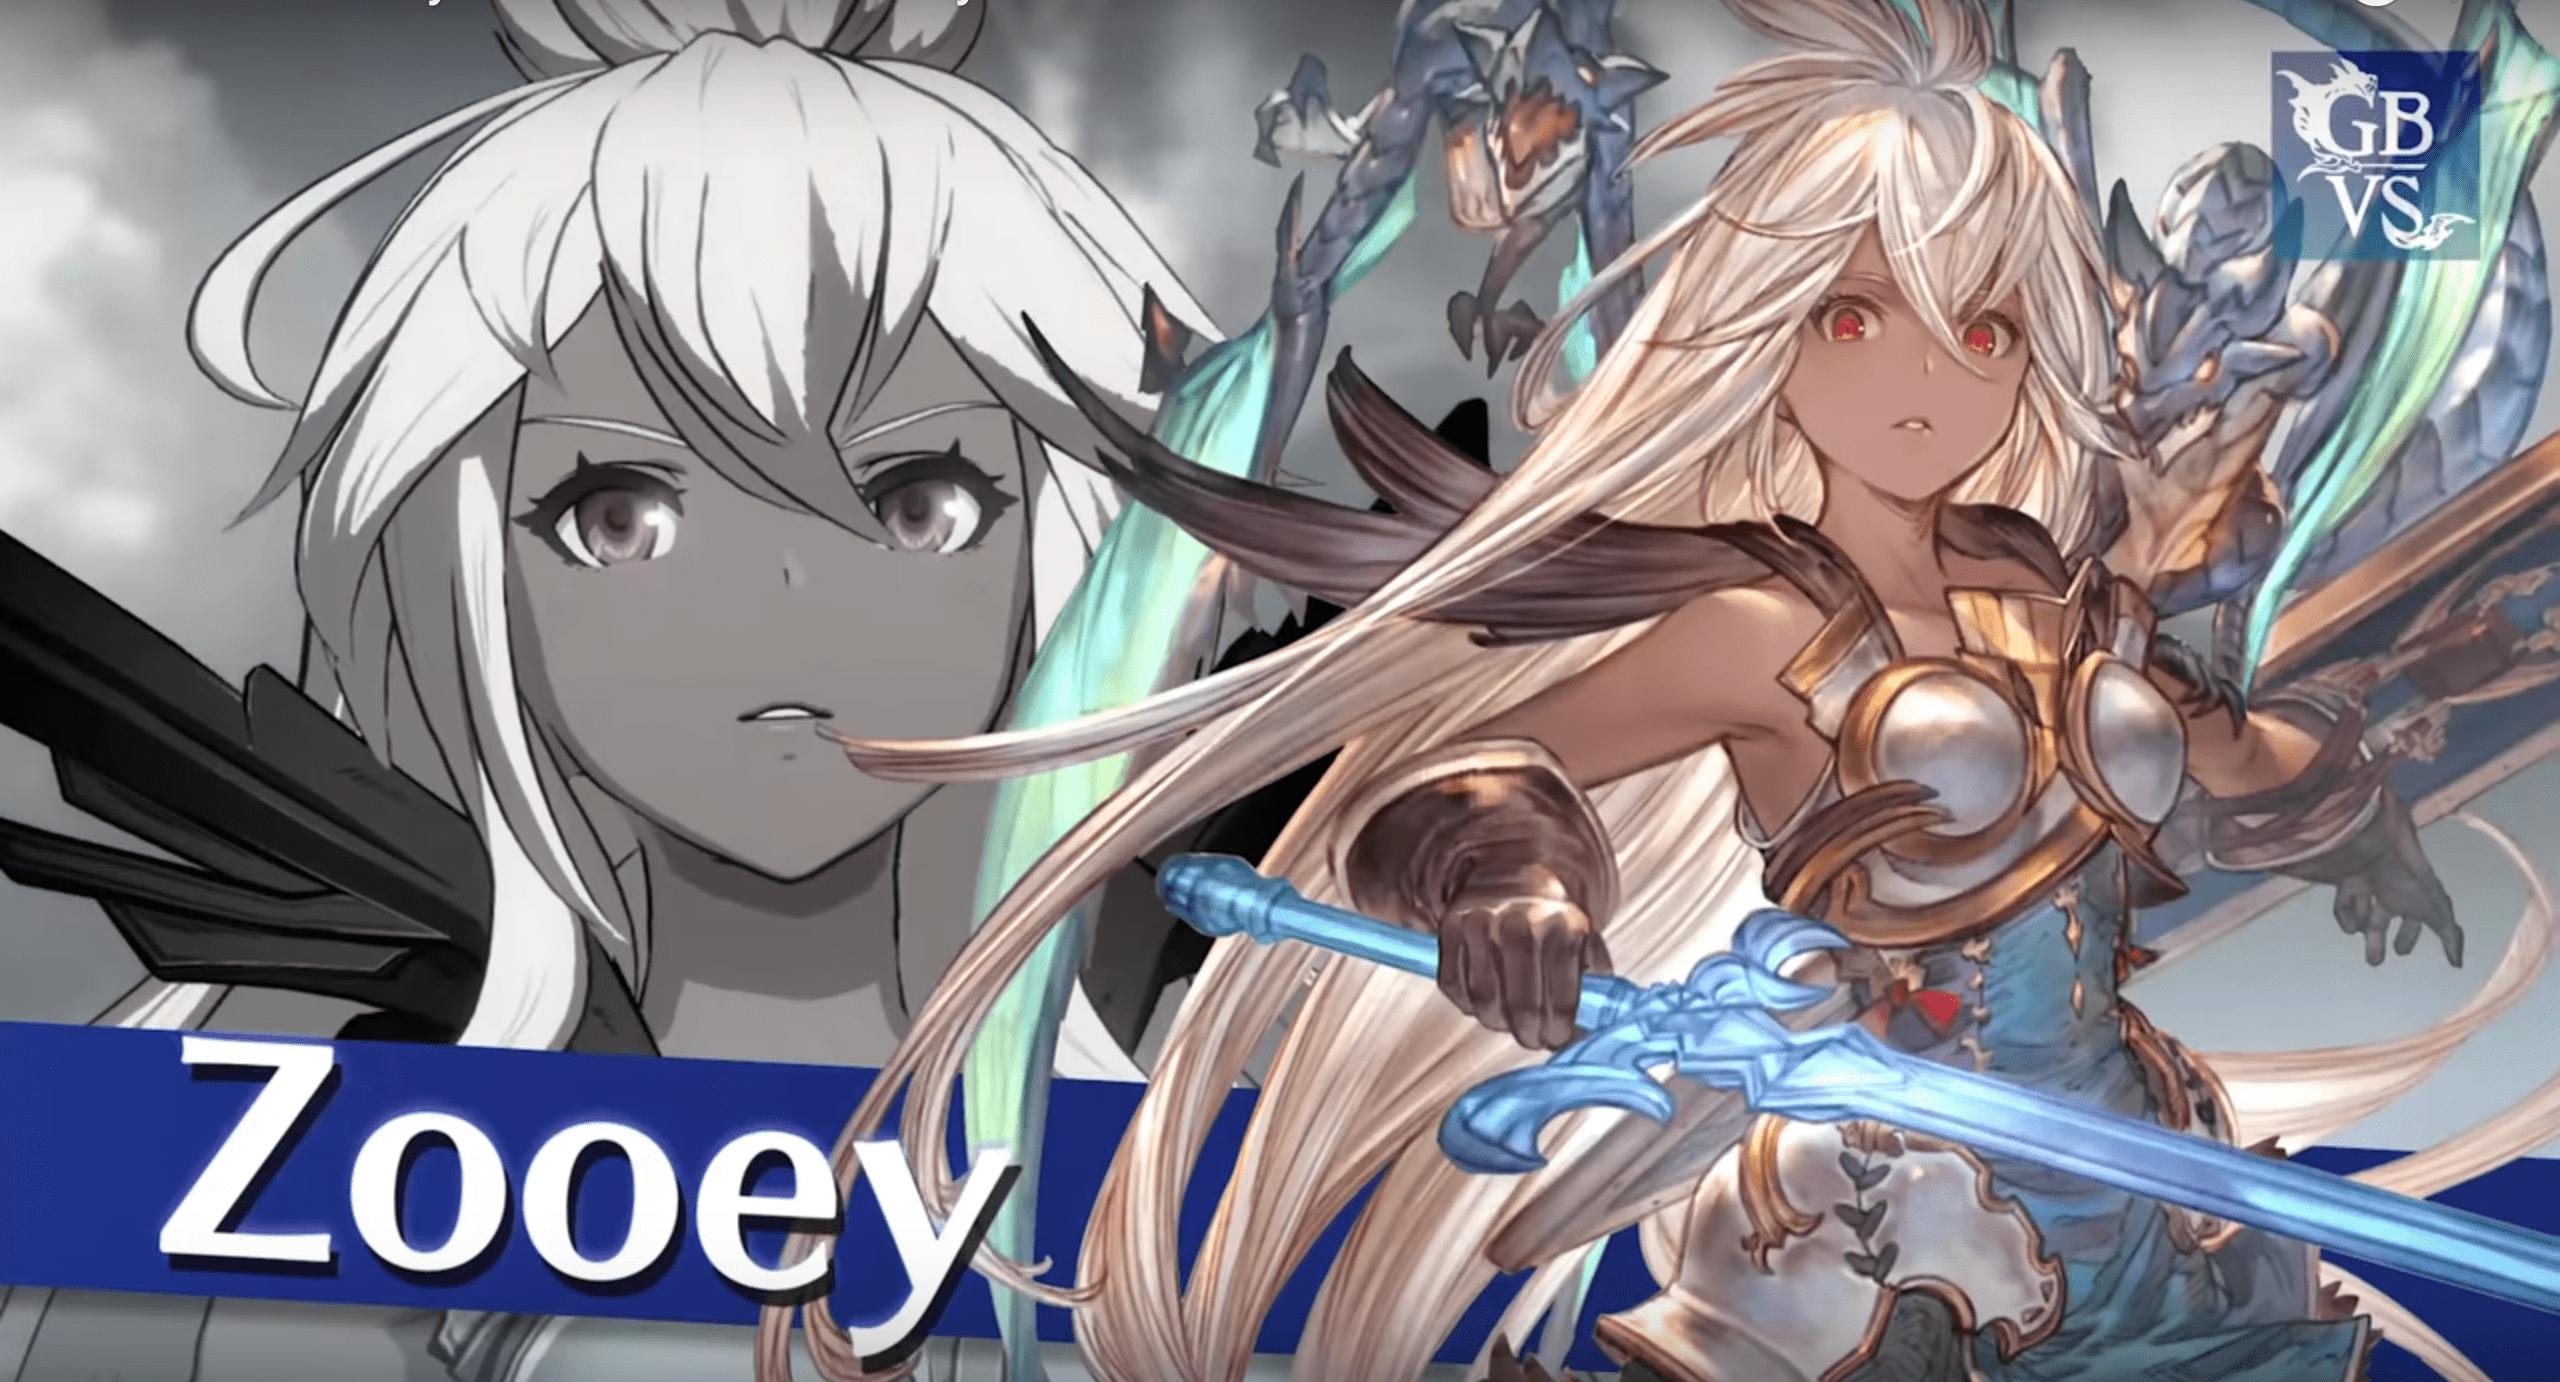 Granblue Fantasy Versus Zooey